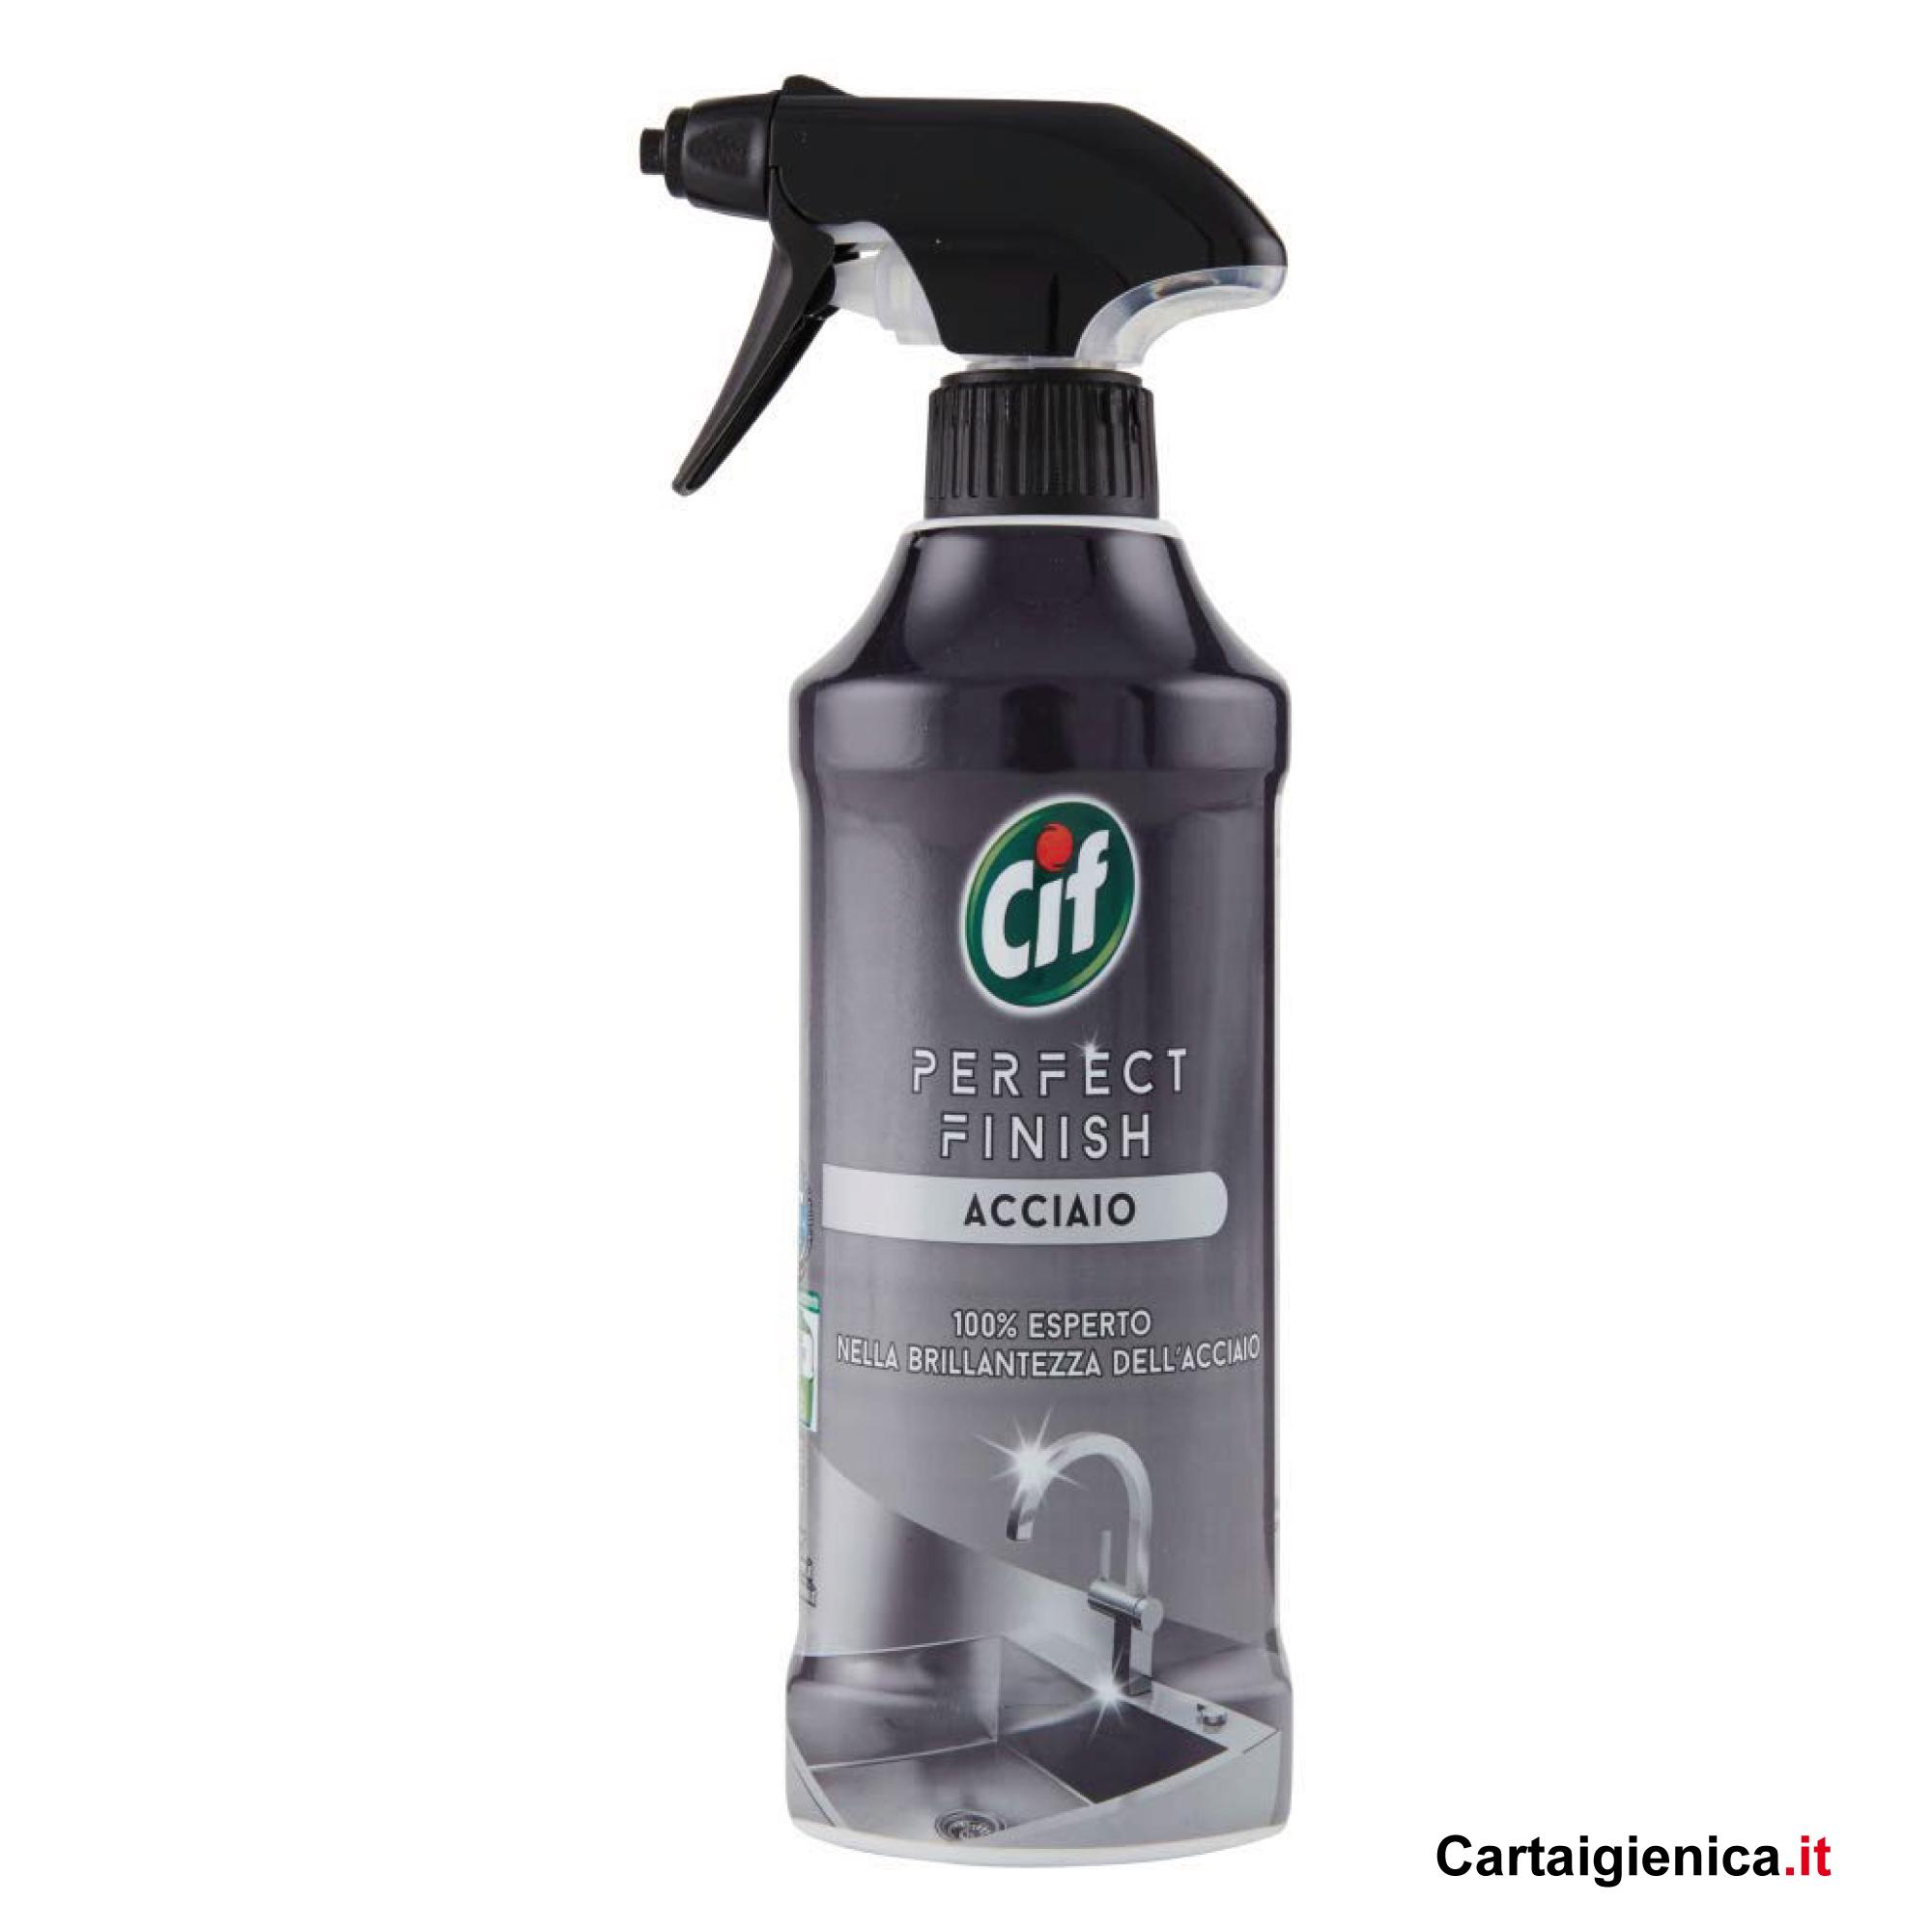 cif perfect finish acciaio spray